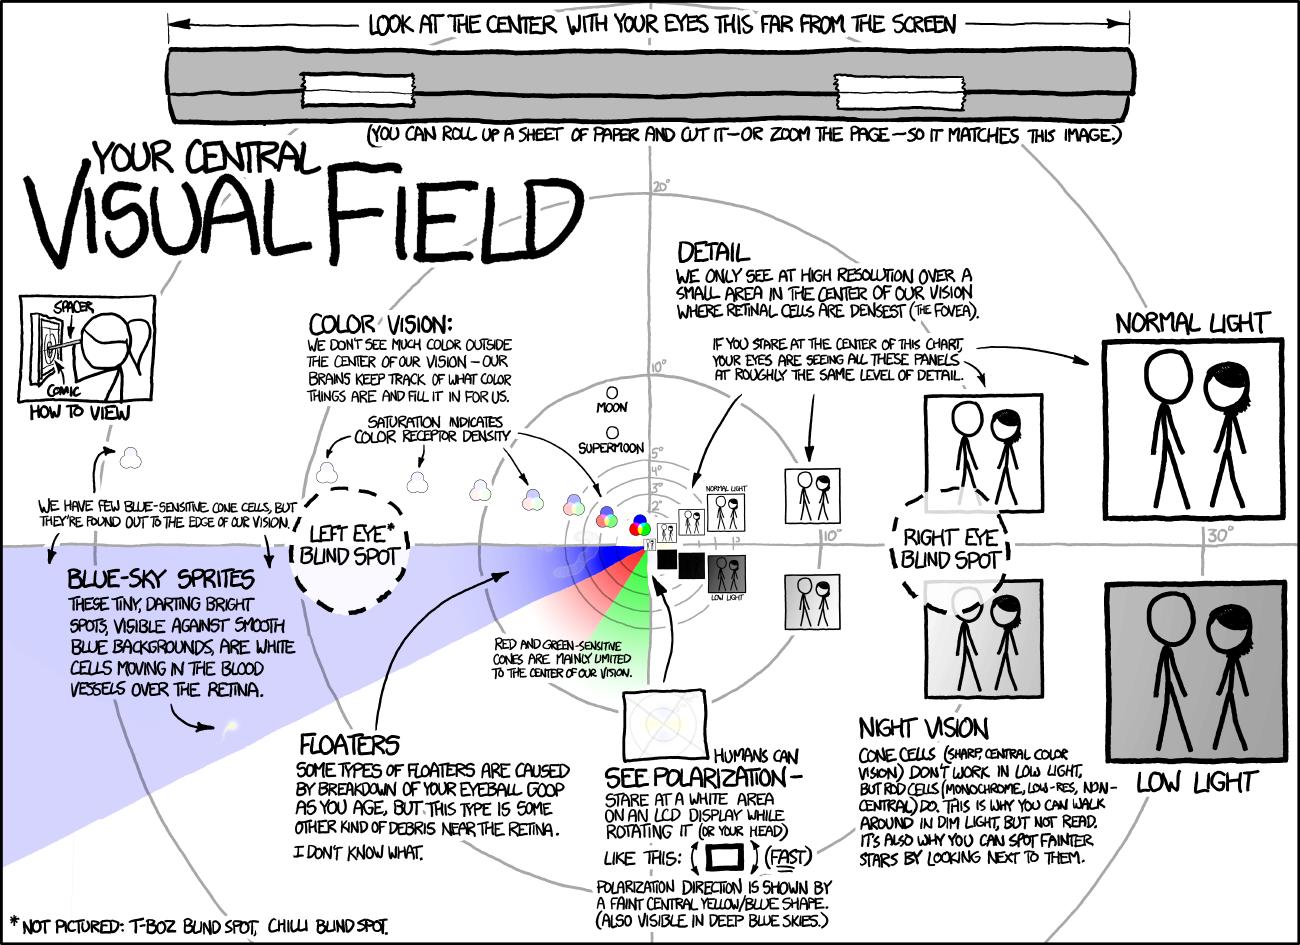 IMAGE(http://imgs.xkcd.com/comics/visual_field_large.png)